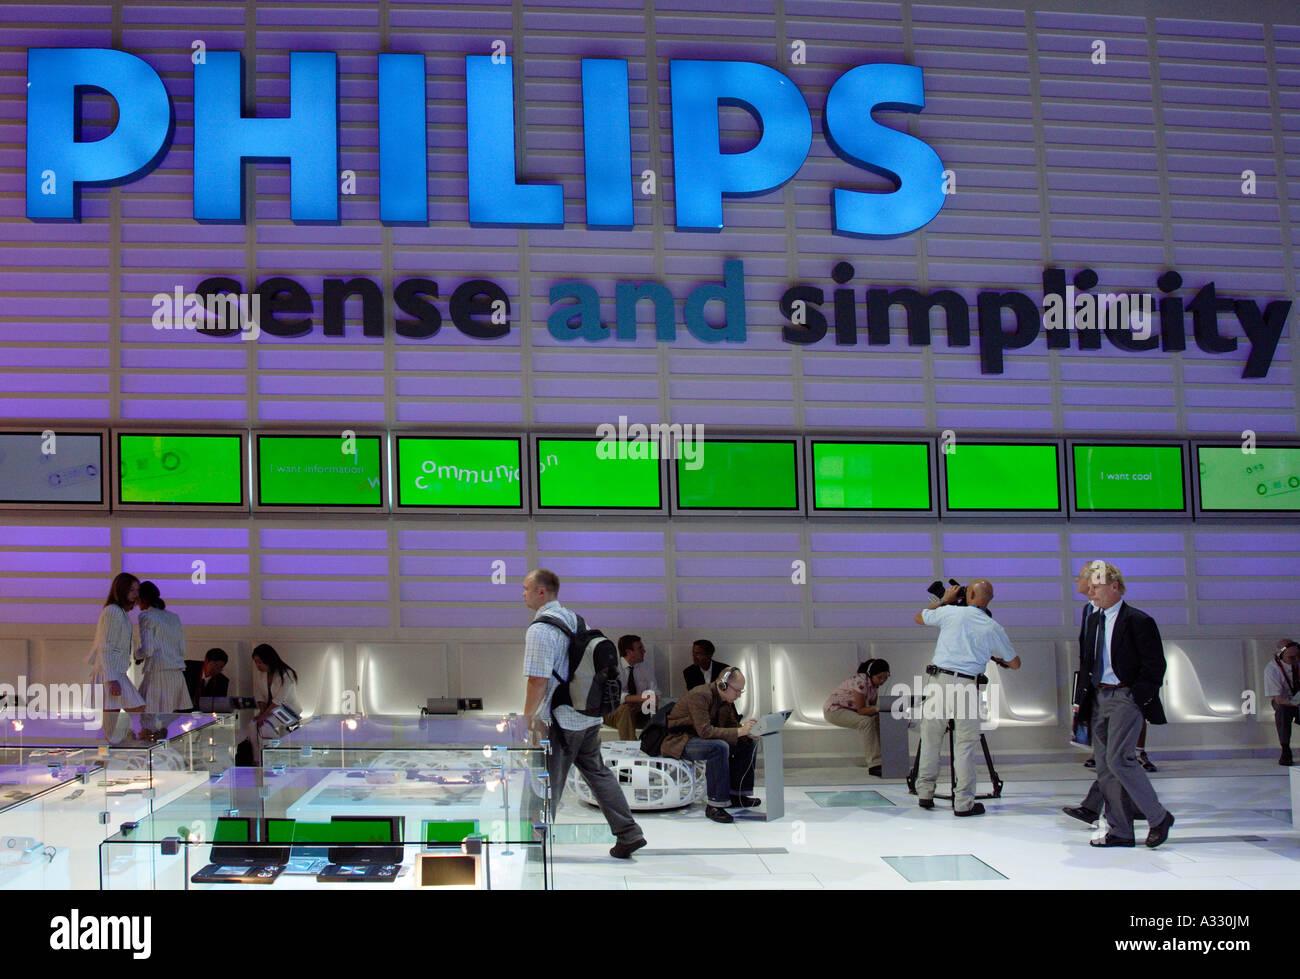 Logo of the electronics company philips at the internationals logo of the electronics company philips at the internationals radio and television exhibition berlin germany buycottarizona